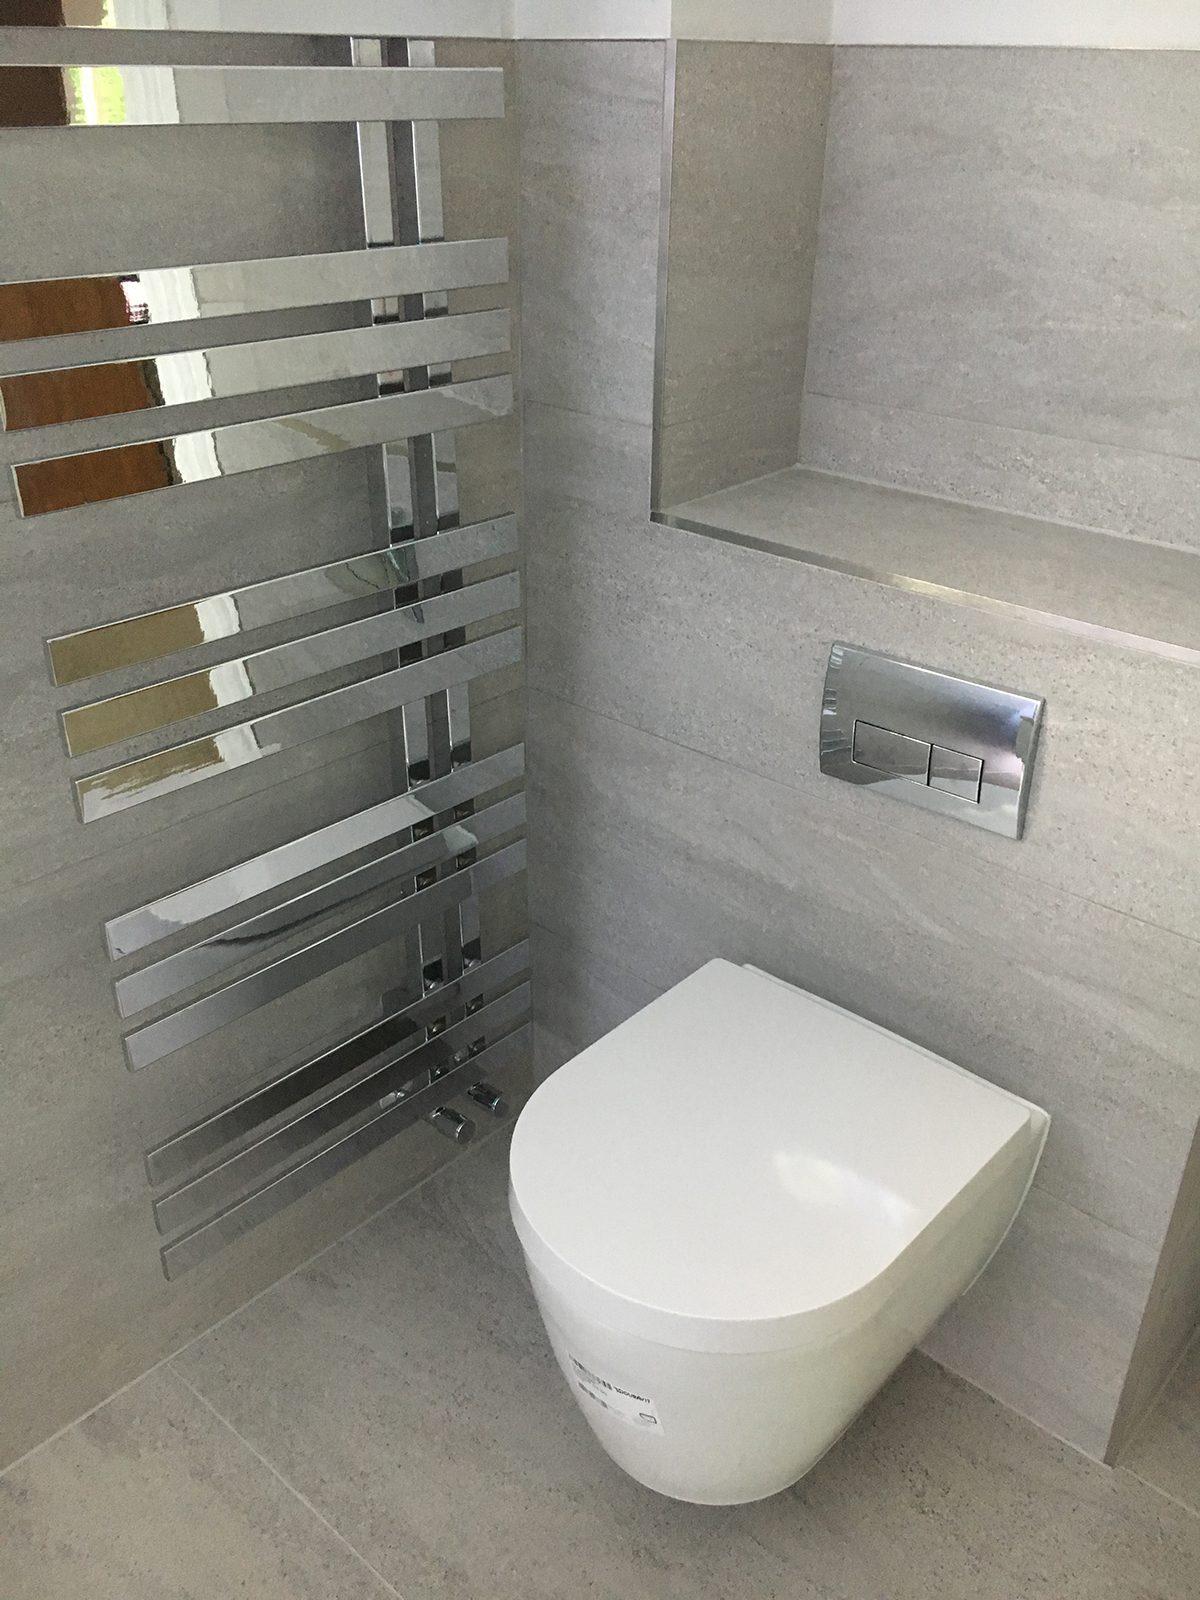 The Cambridge Bath Co bathroom toilet and wall heater radiator